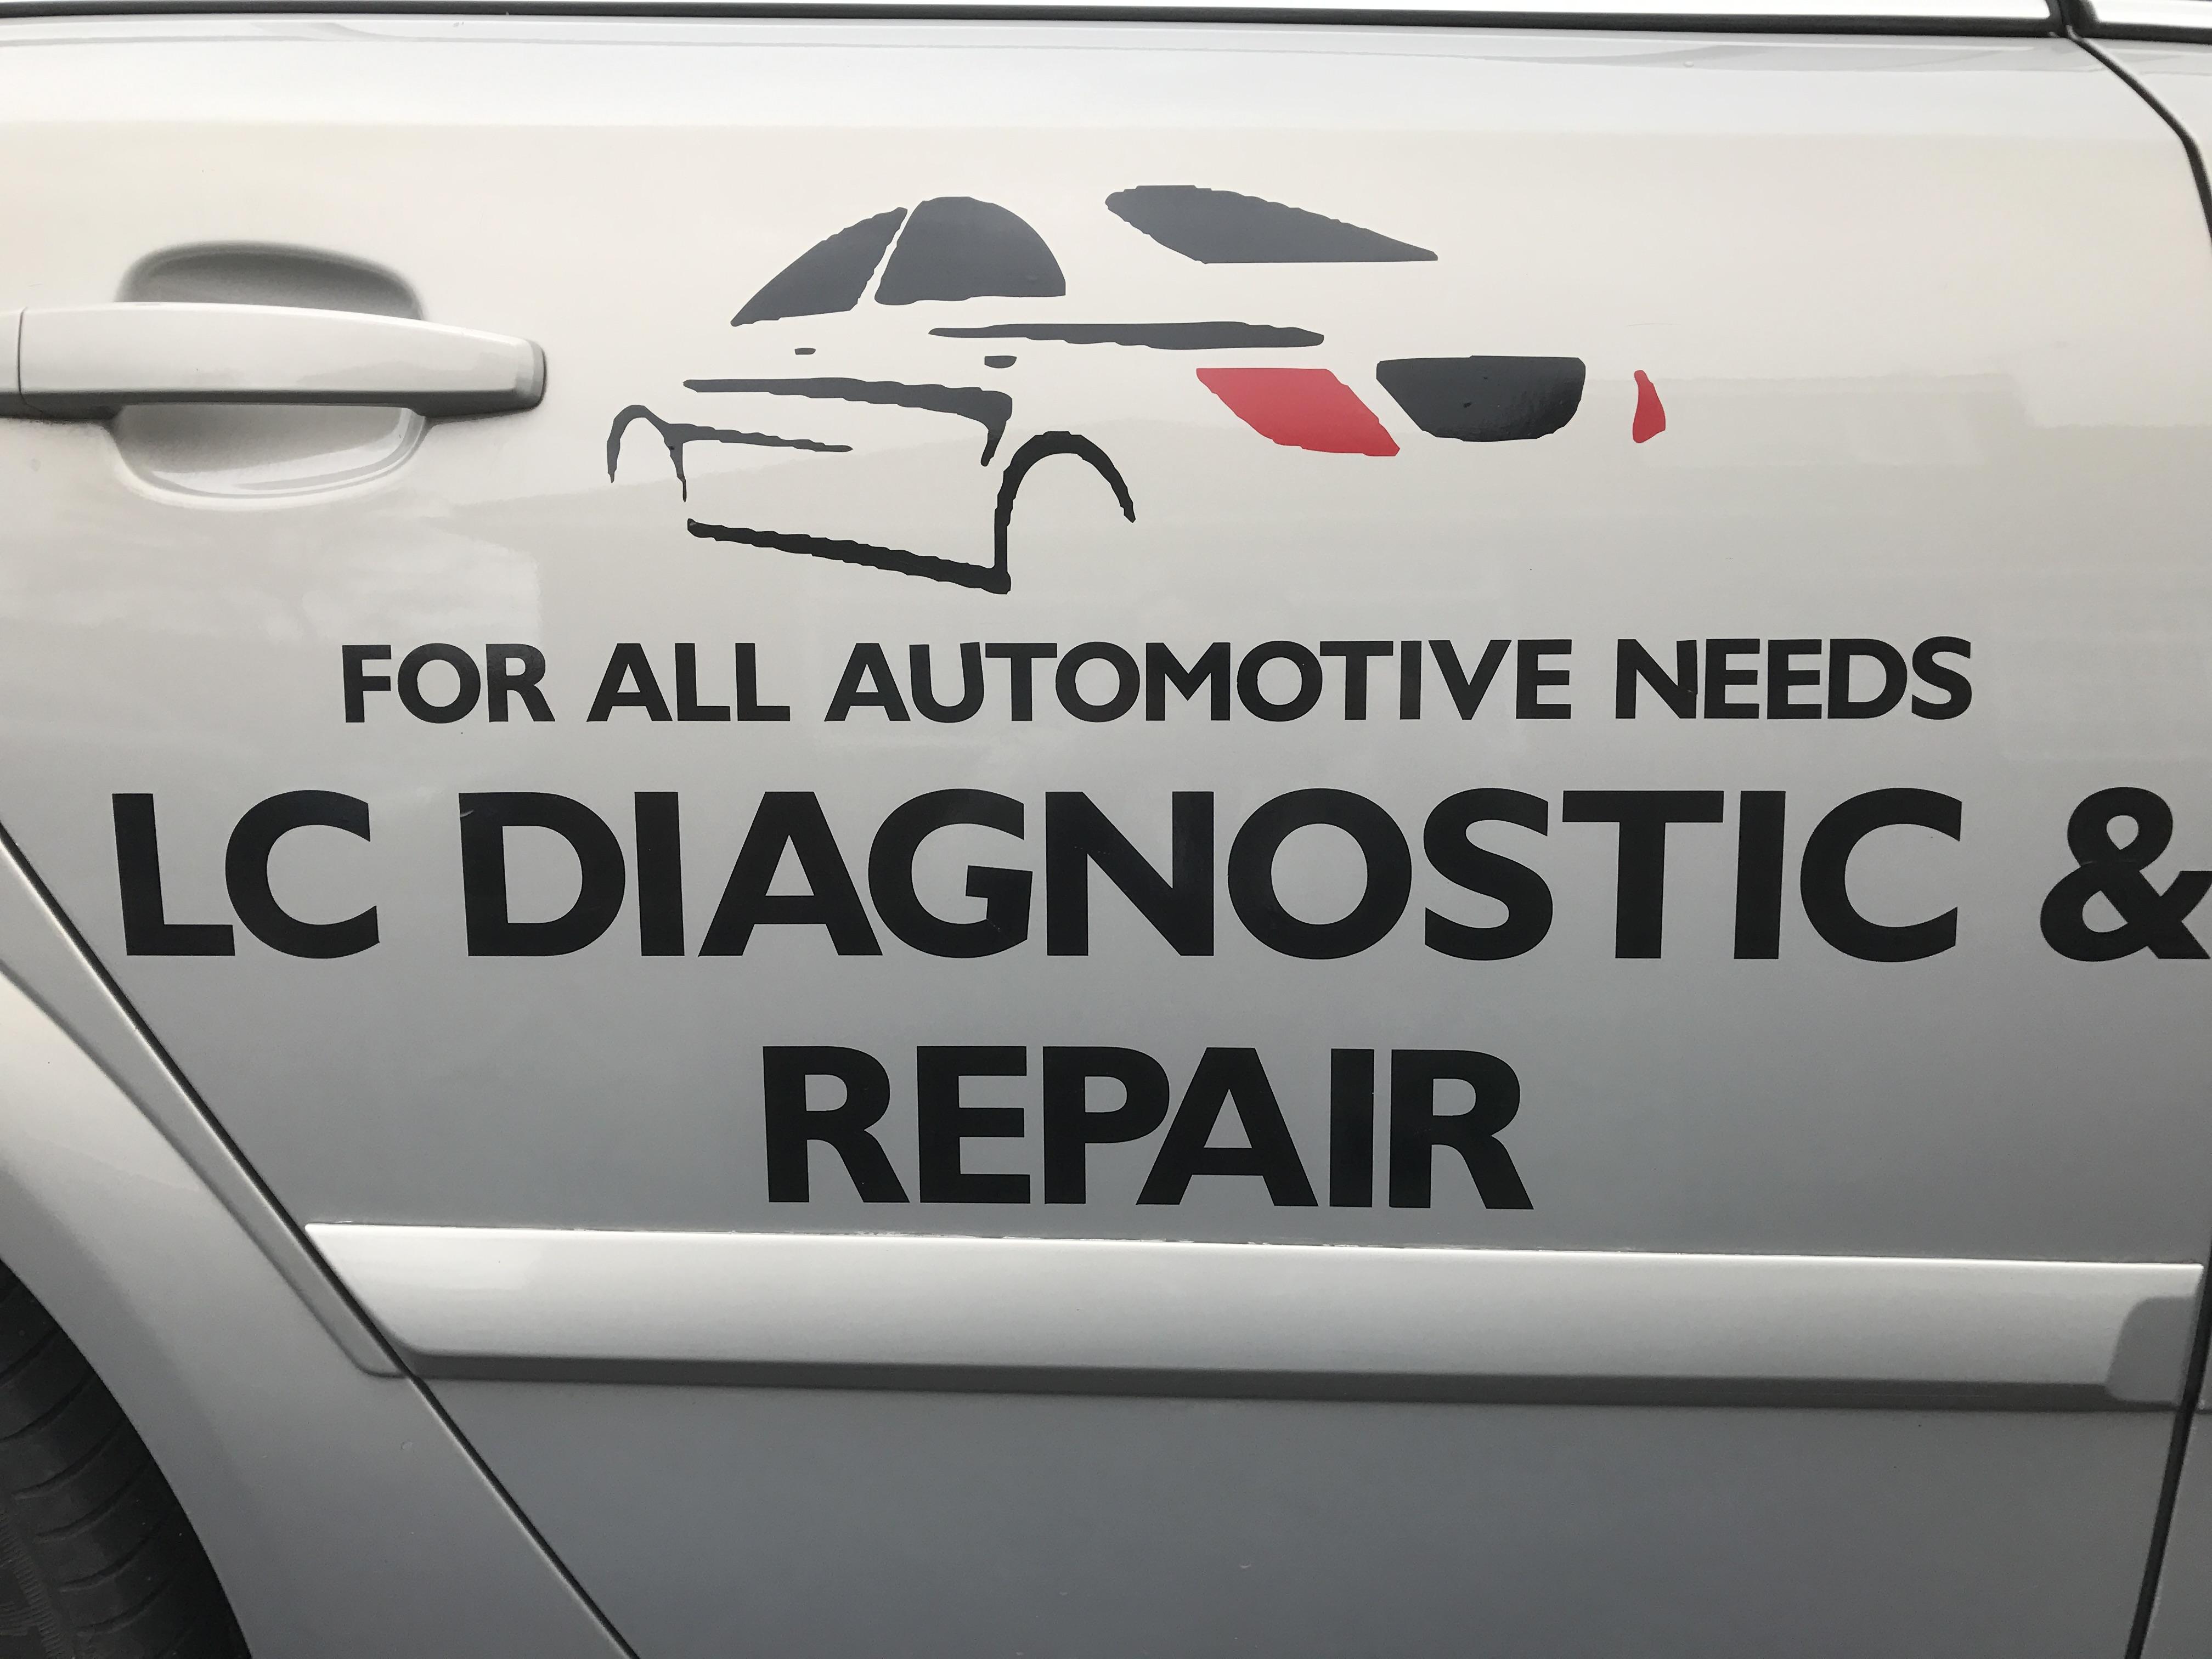 LC Diagnostic & Repair logo